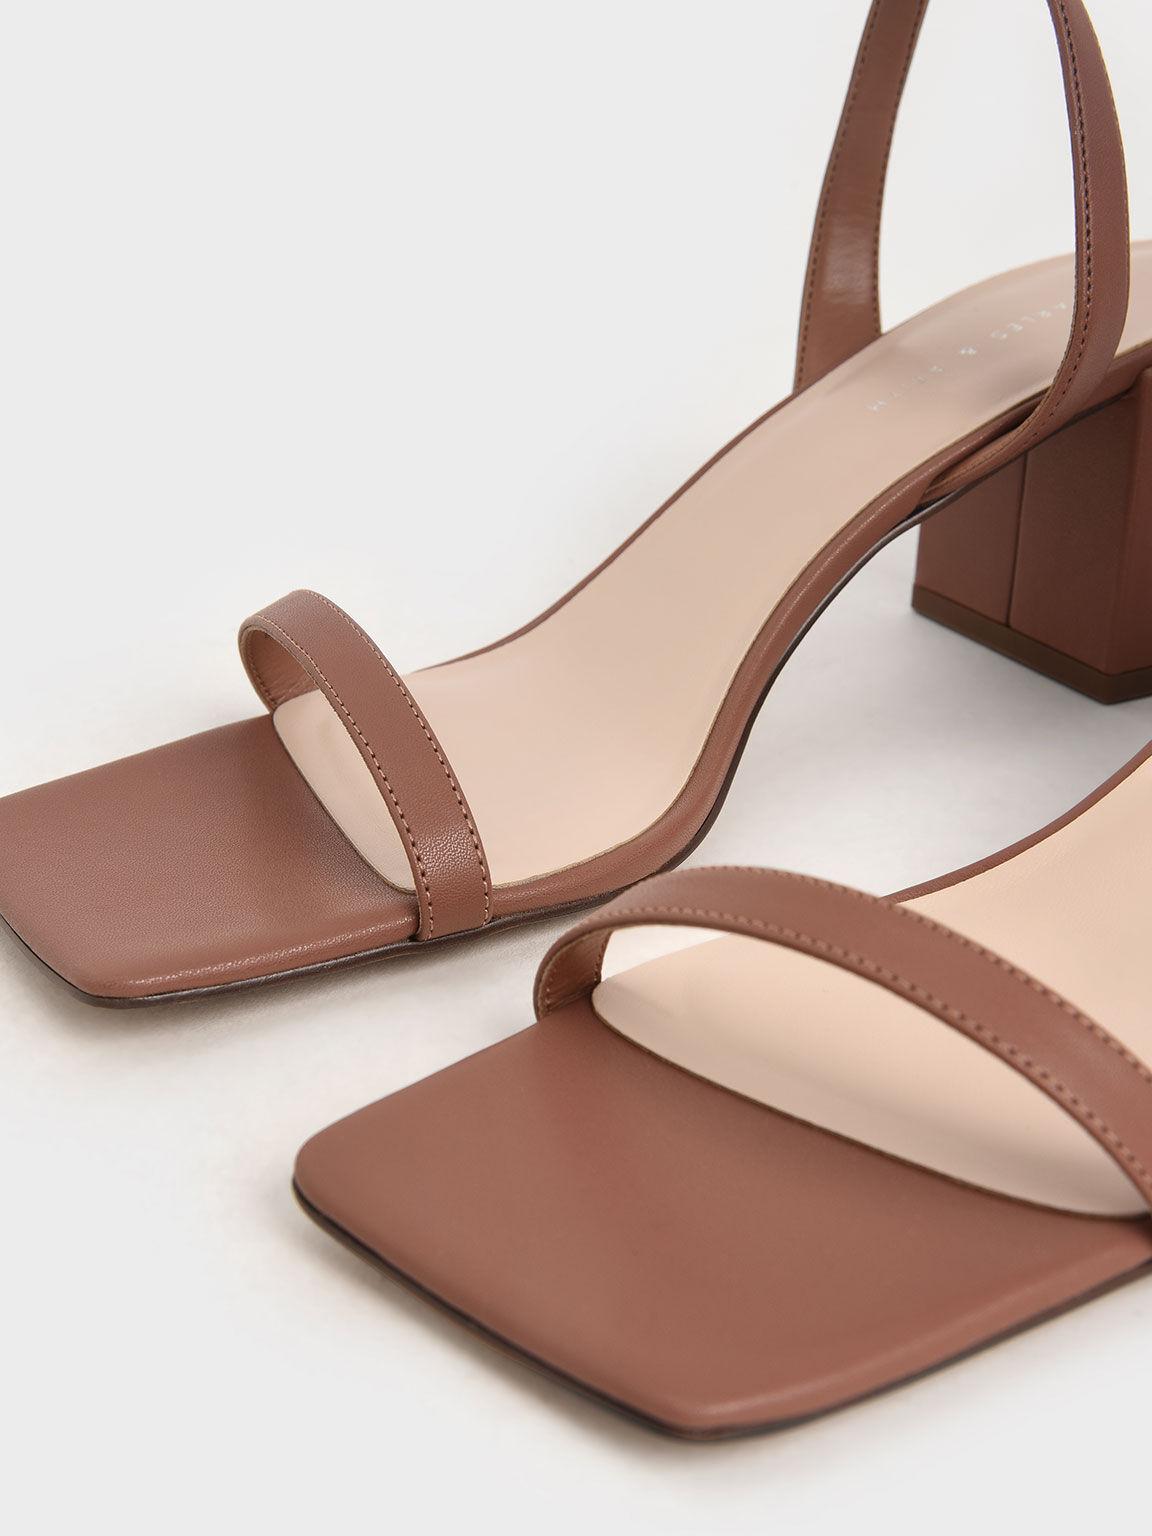 Ankle Strap Block Heel Sandals, Brick, hi-res